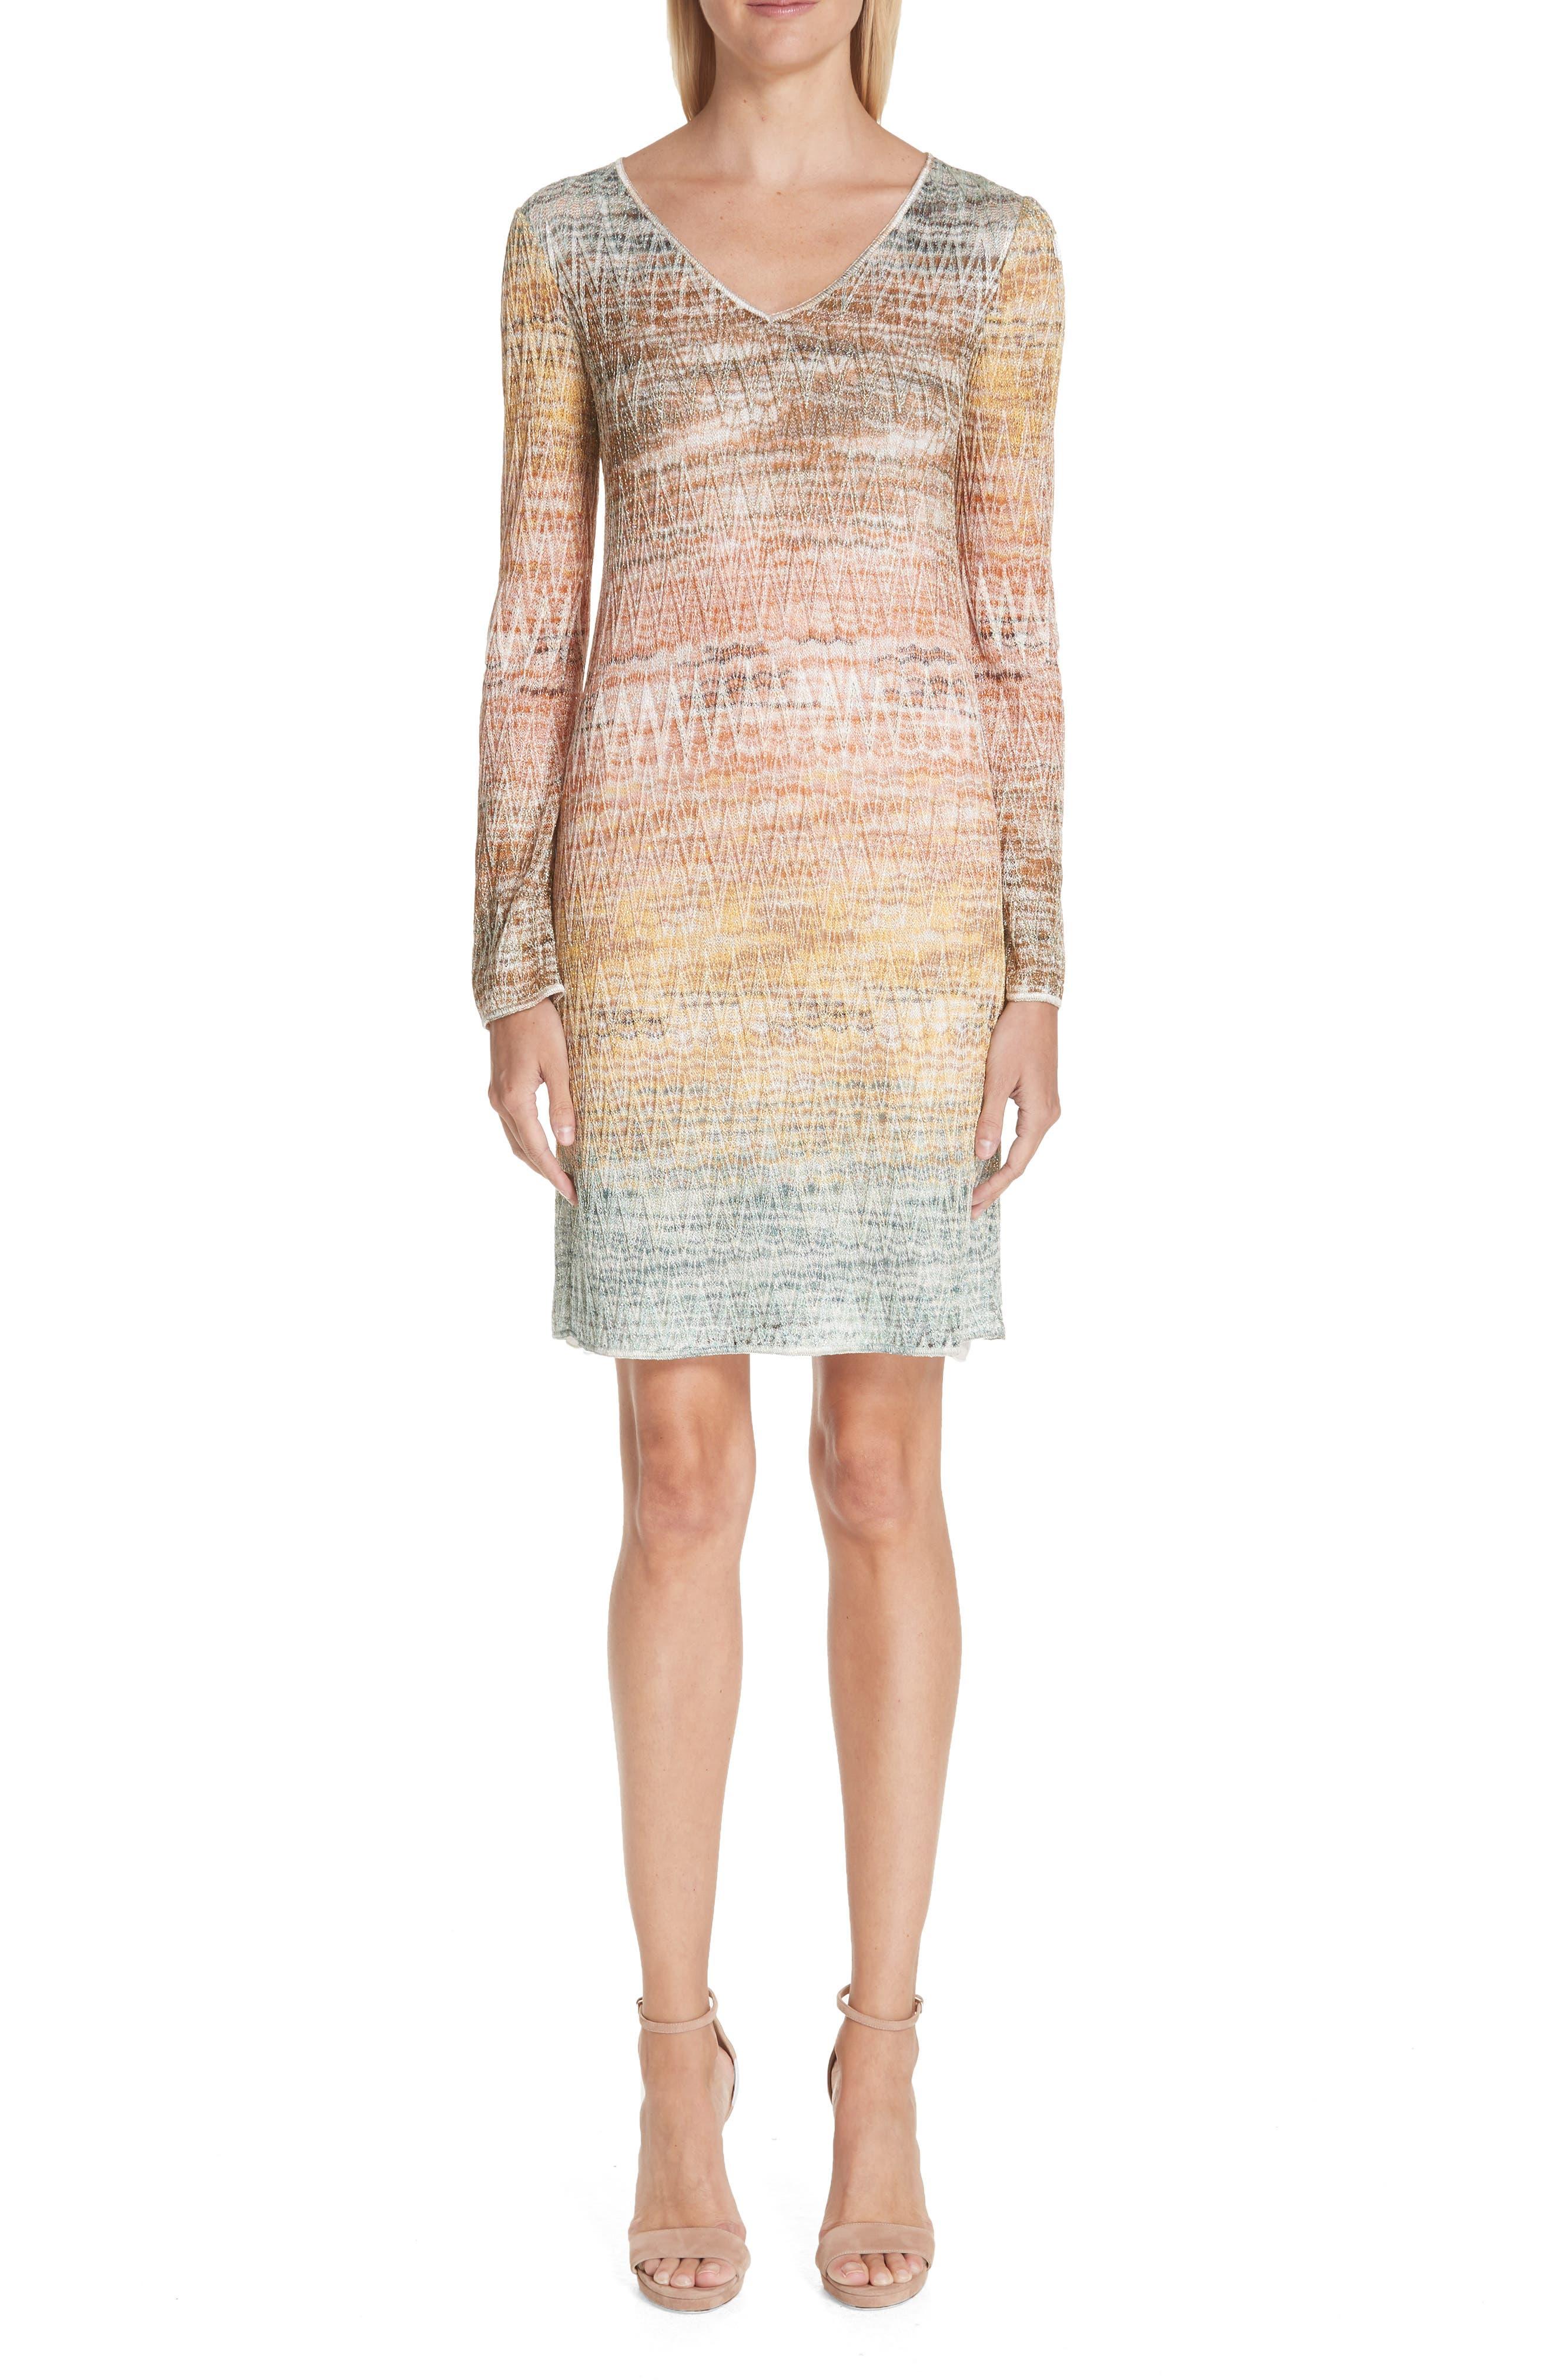 Missoni Zig Zag Metallic Knit Dress, US / 46 IT - White